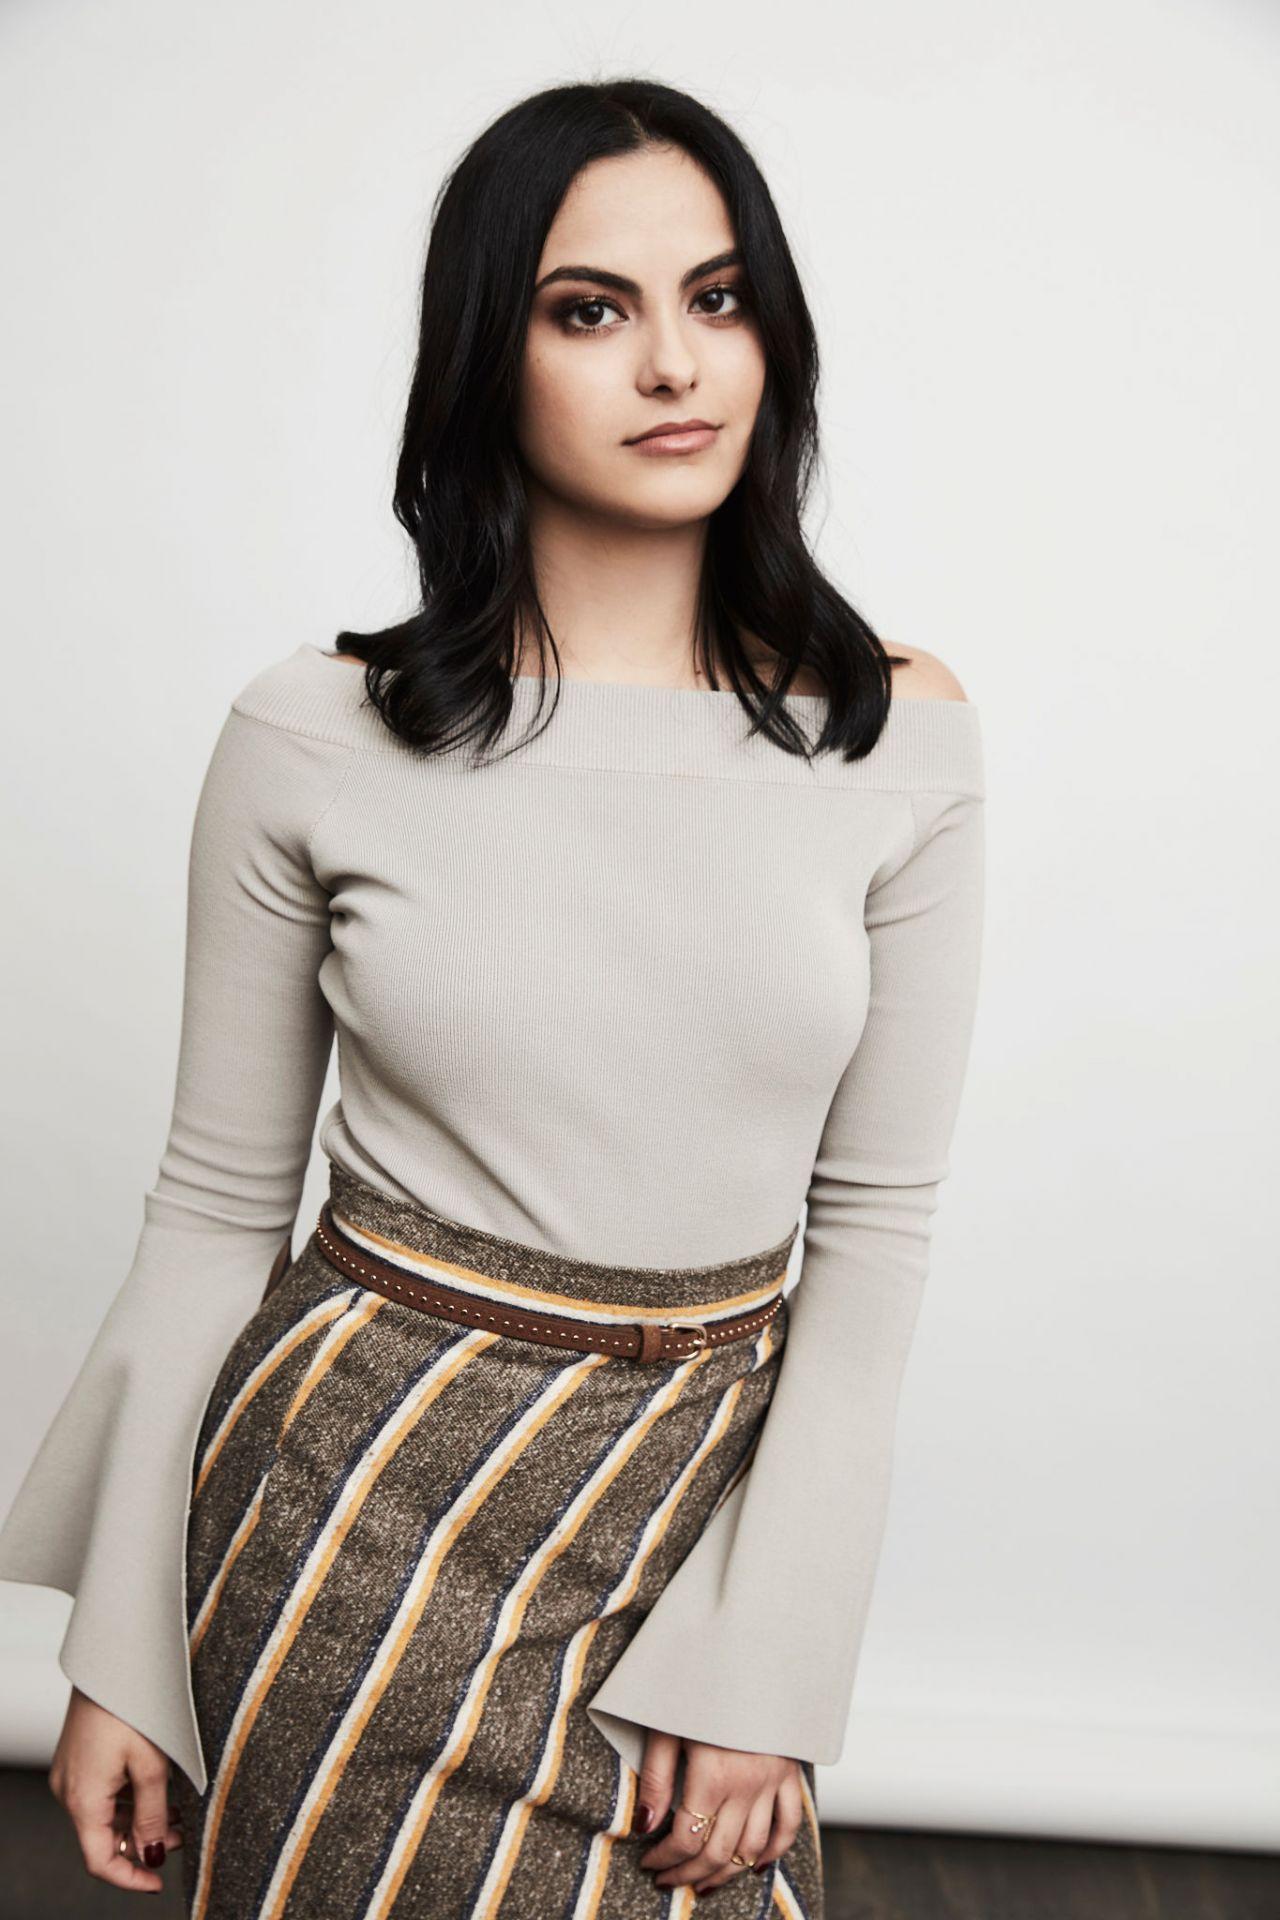 Supreme Goddess PaigeMalfoy aka Paige (Alex IRL)